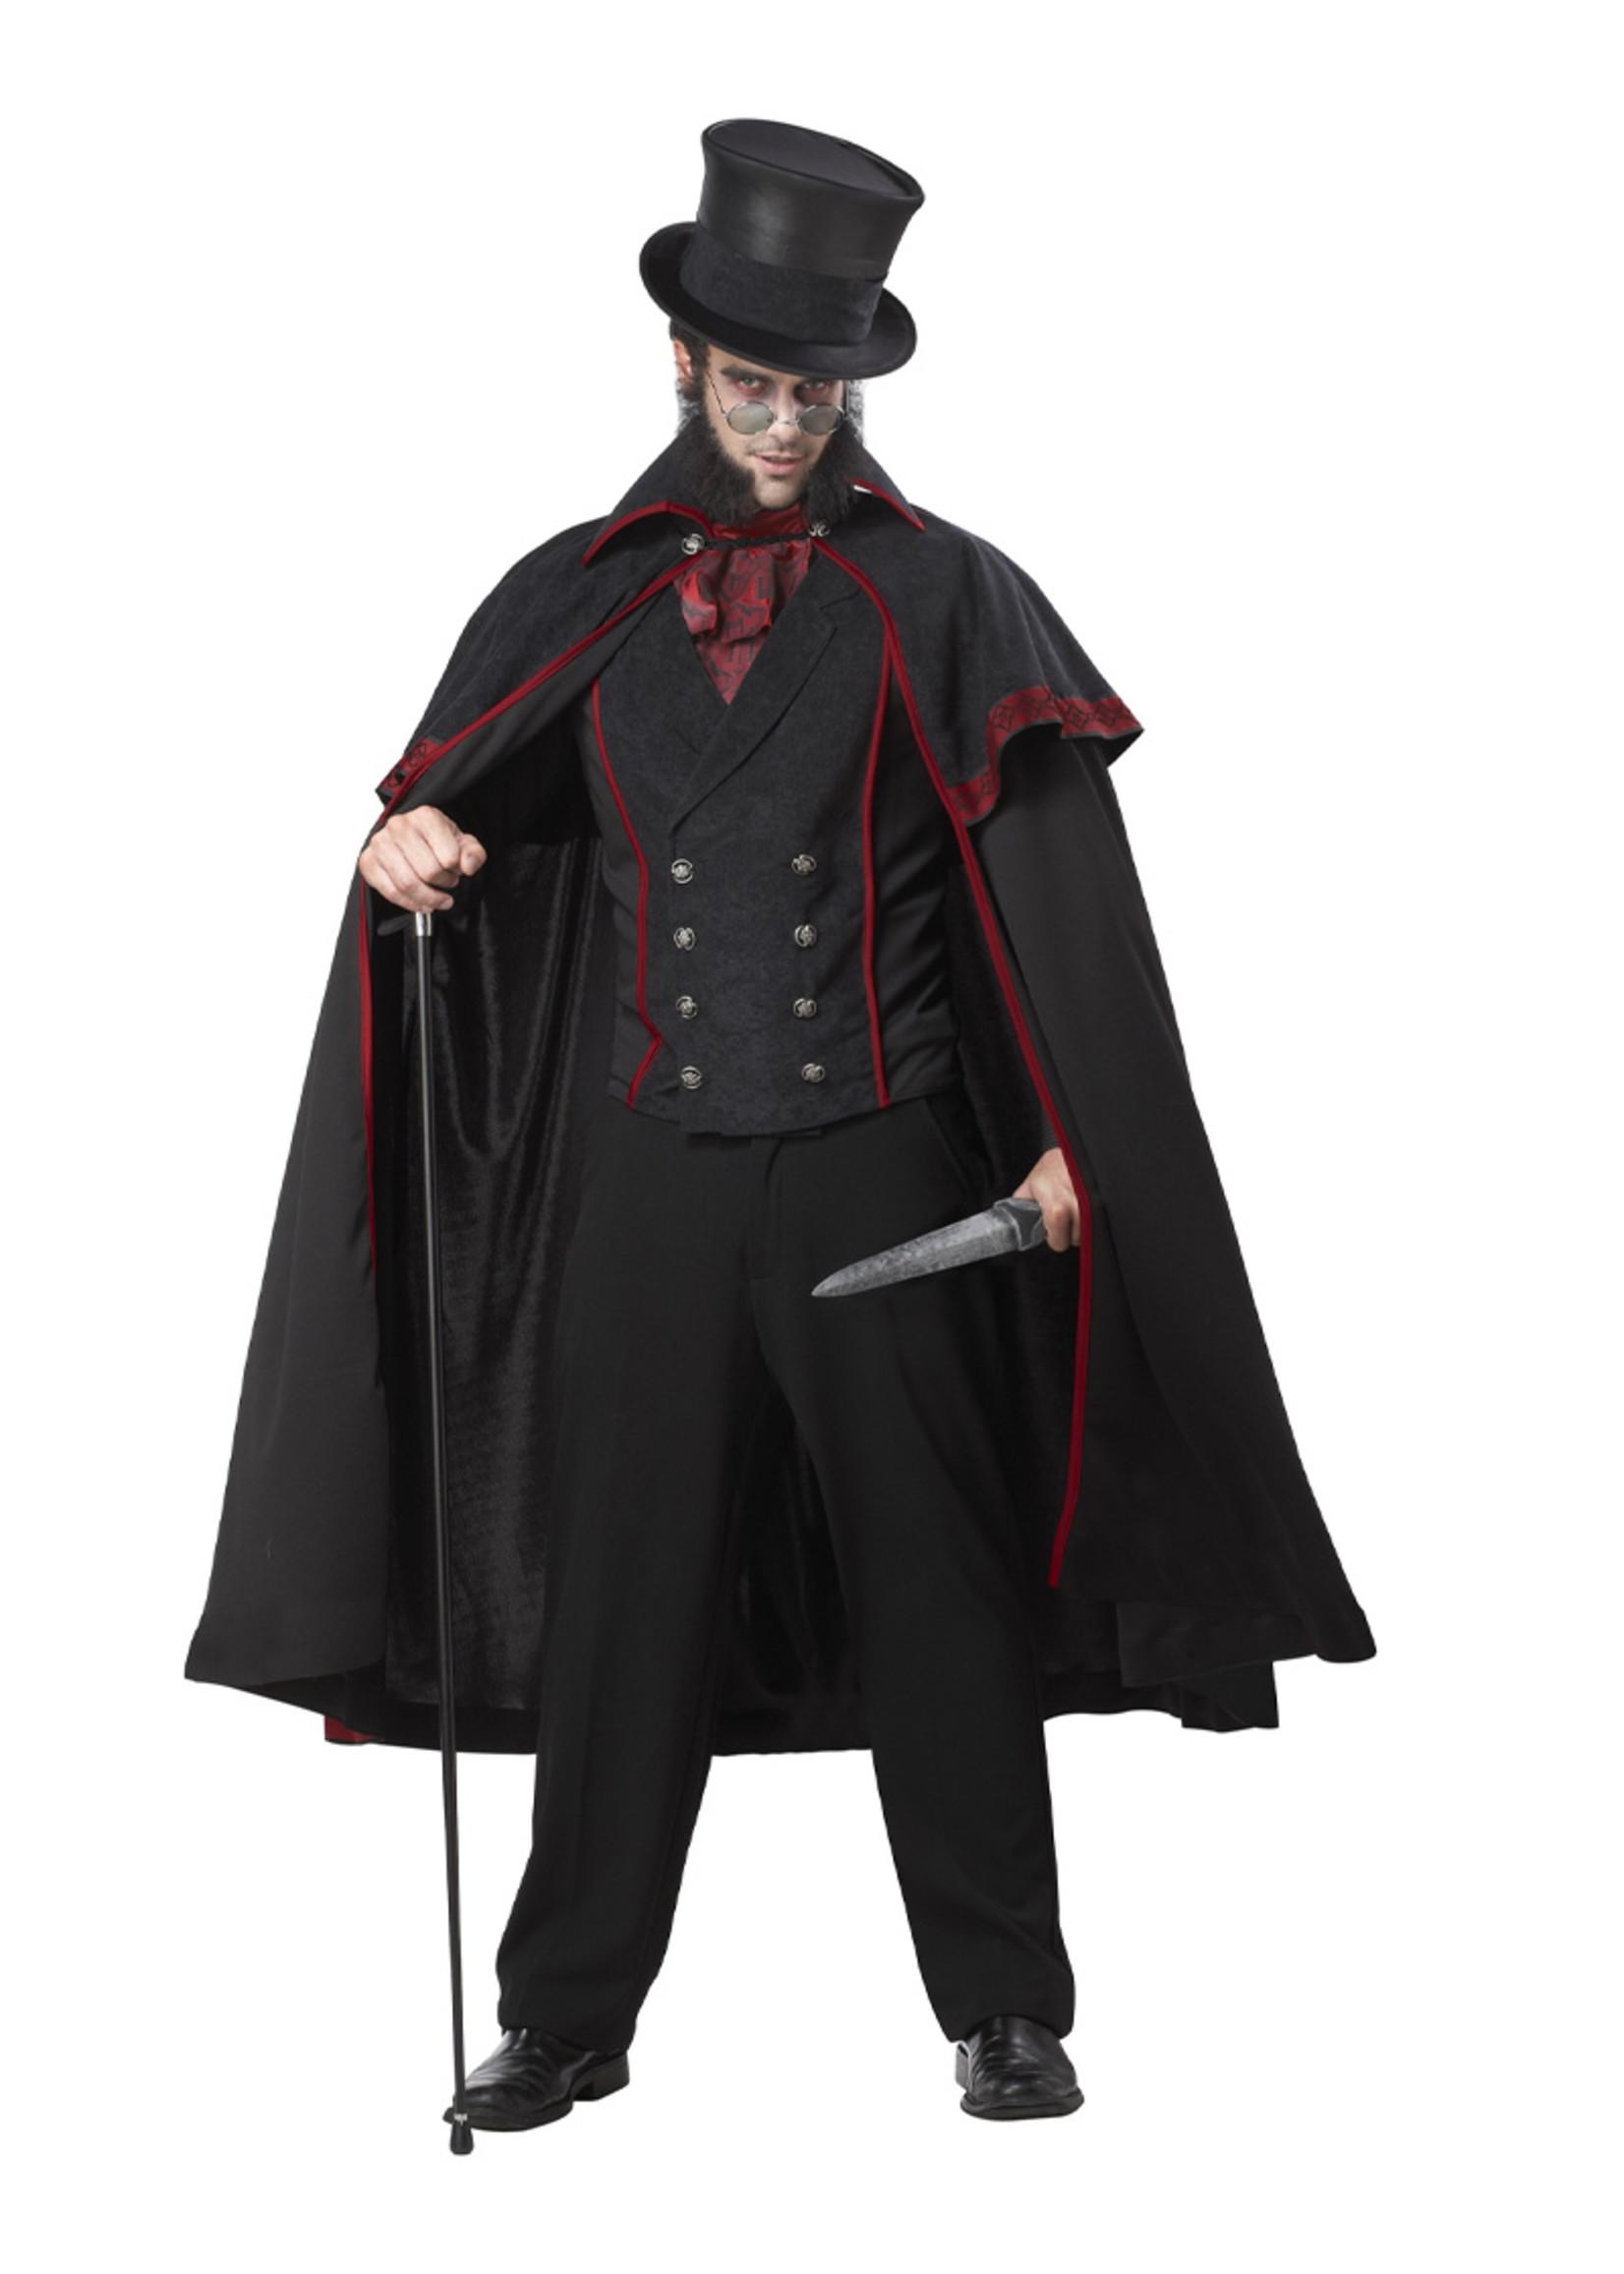 Jack the Ripper Costume - Men's